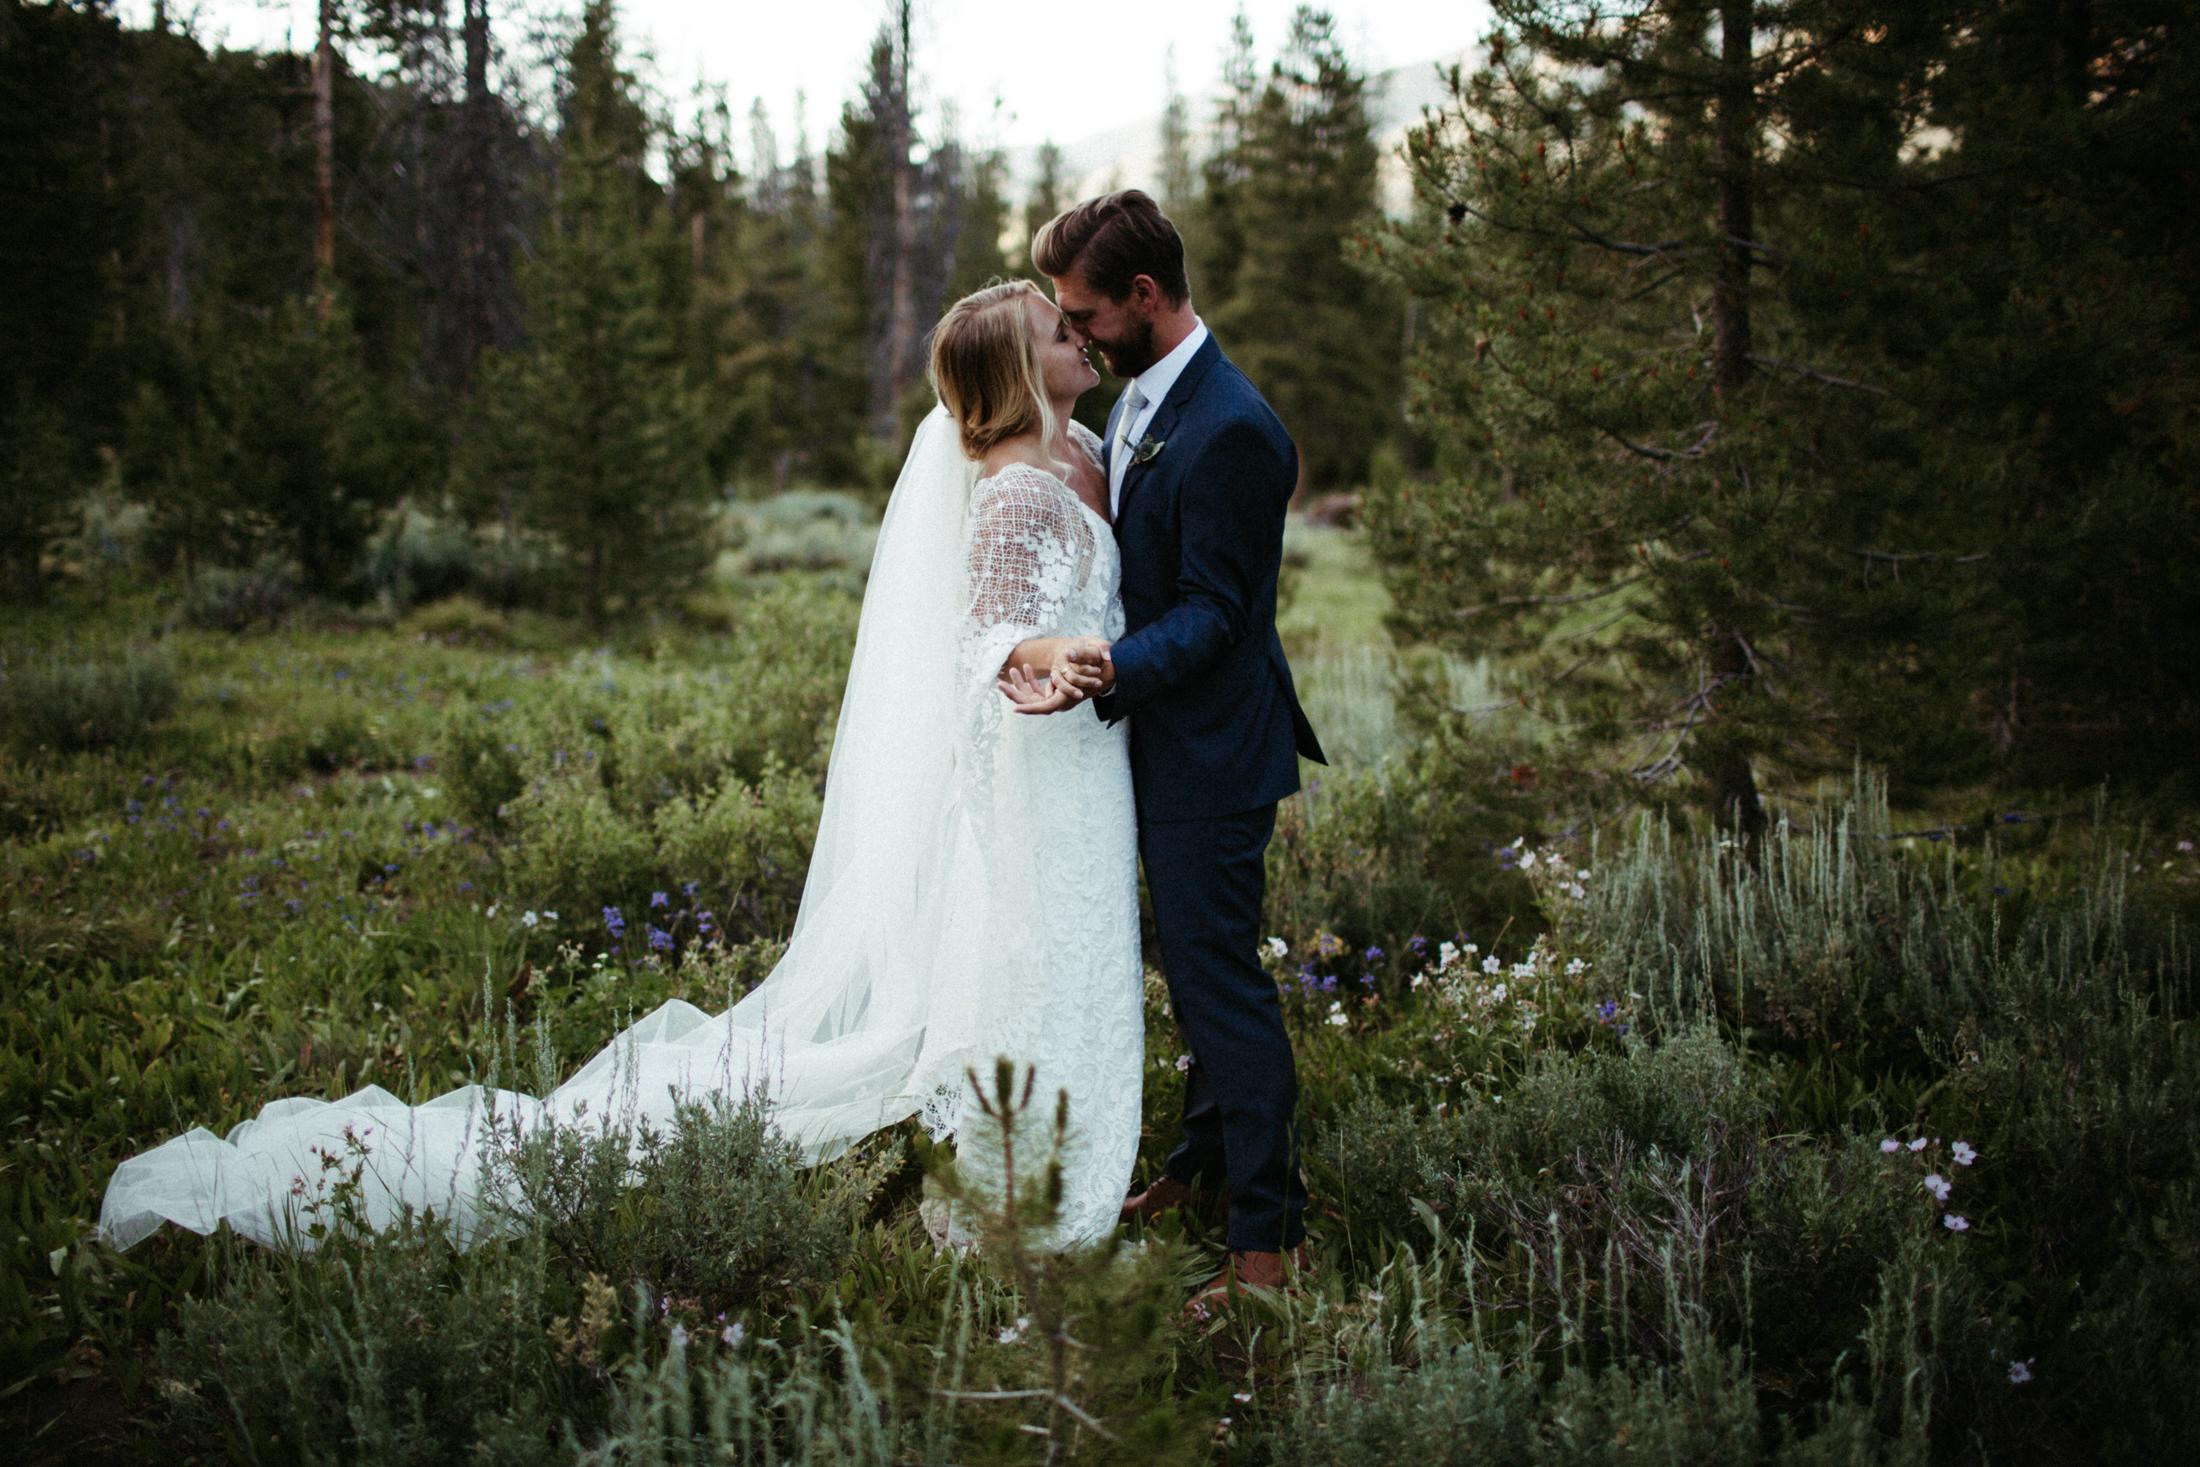 Tag + Kacie | Idaho 4-H camp Wedding